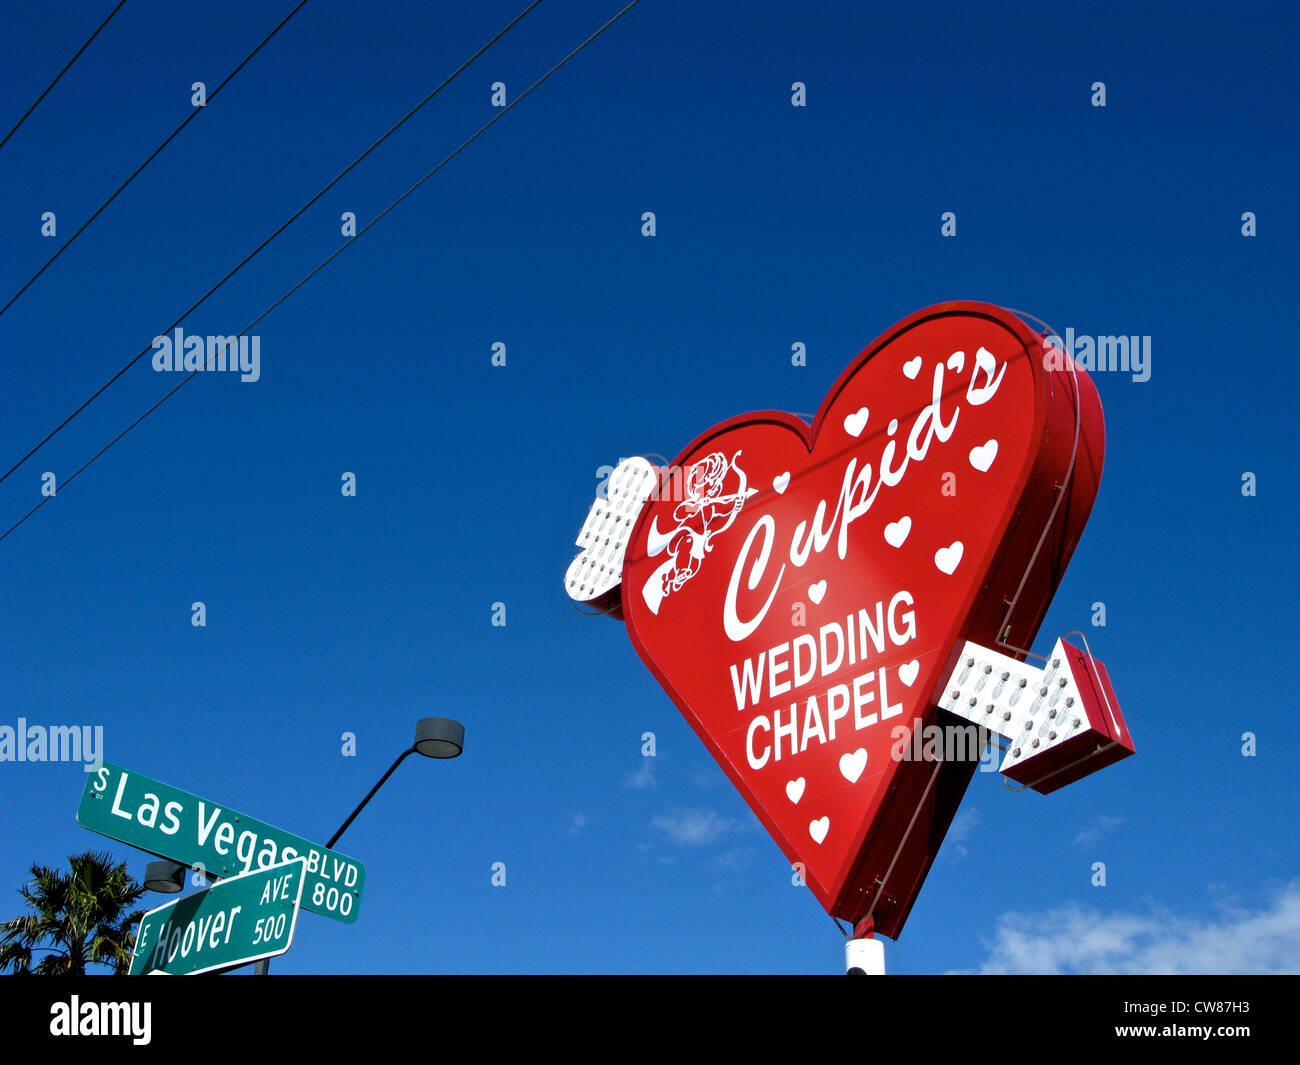 Cupid S Wedding Chapel Red Heart Sign Neon Arrow Las Vegas